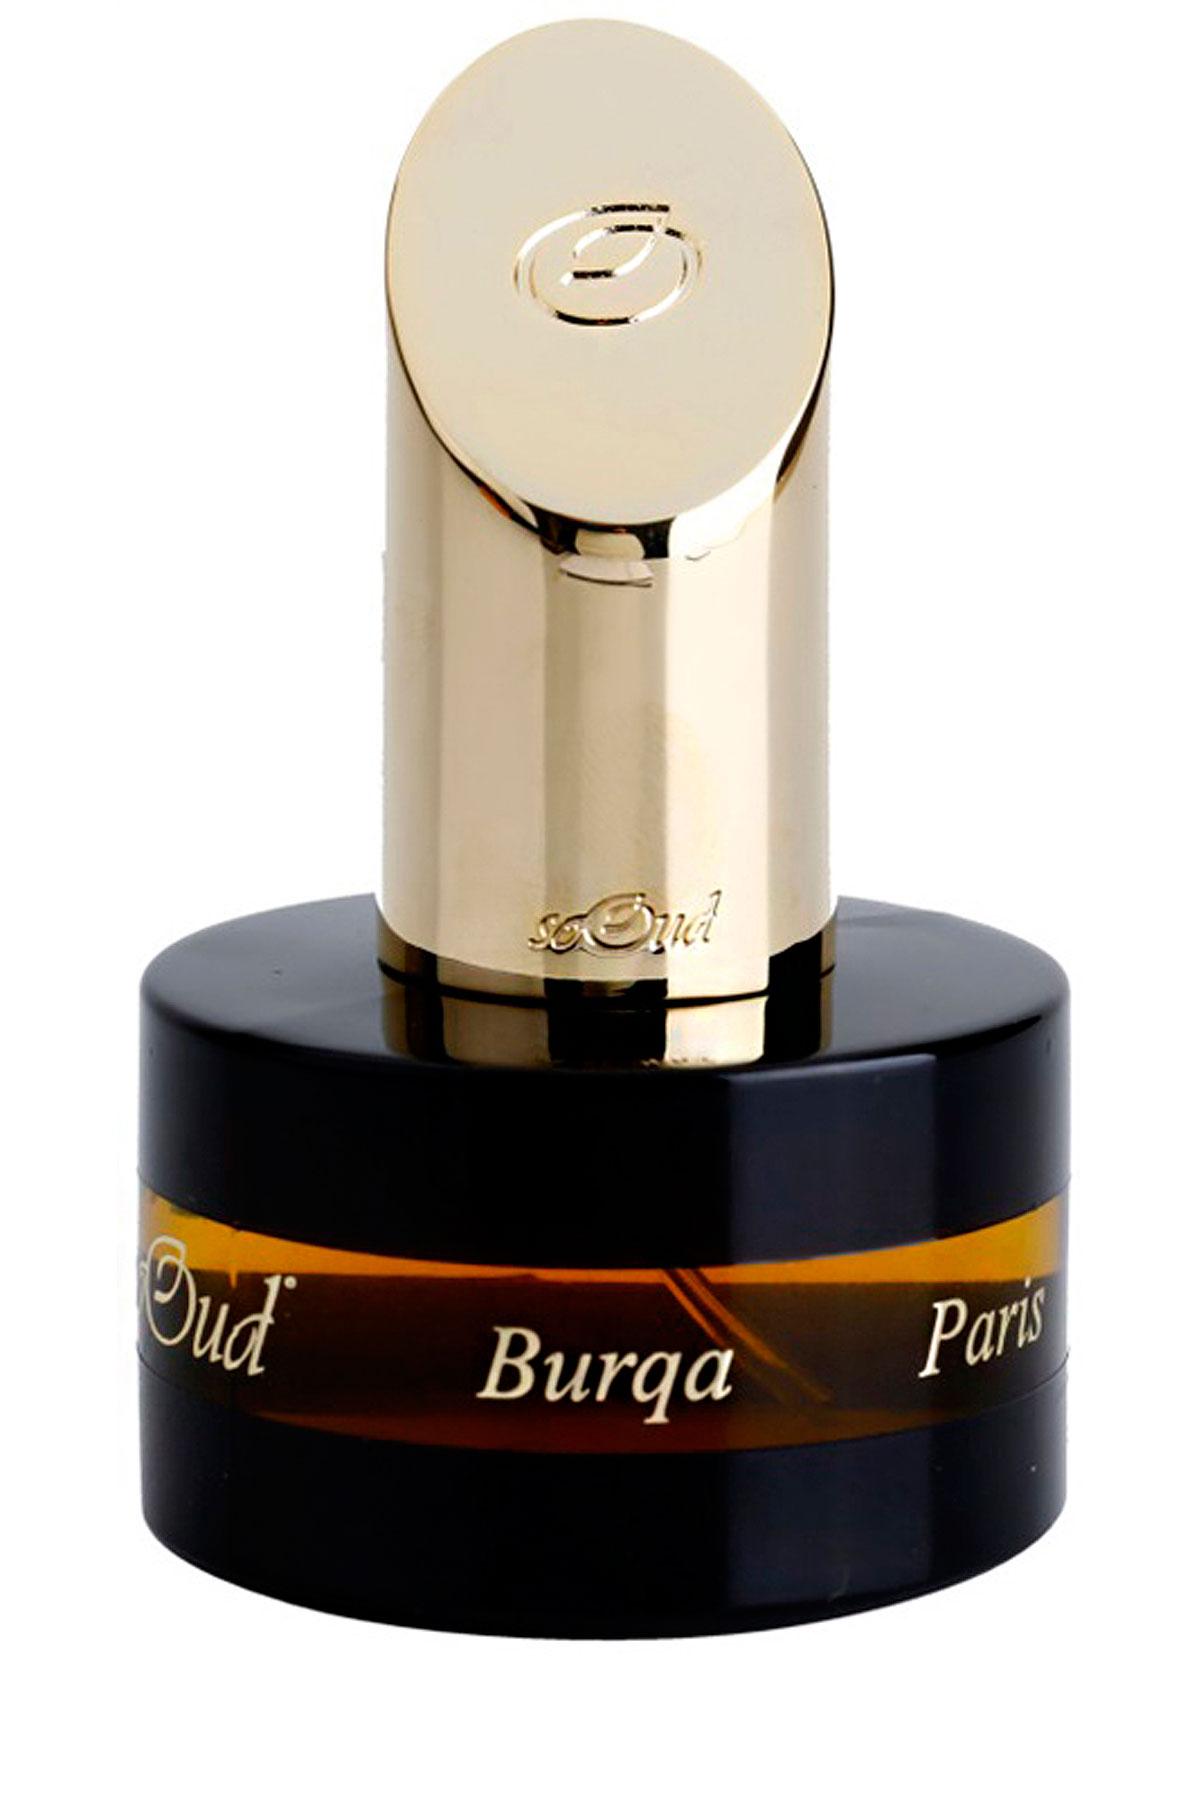 SoOud Fragrances for Men, Burqa - Parfume Nektar - 30 Ml, 2019, 30 ml